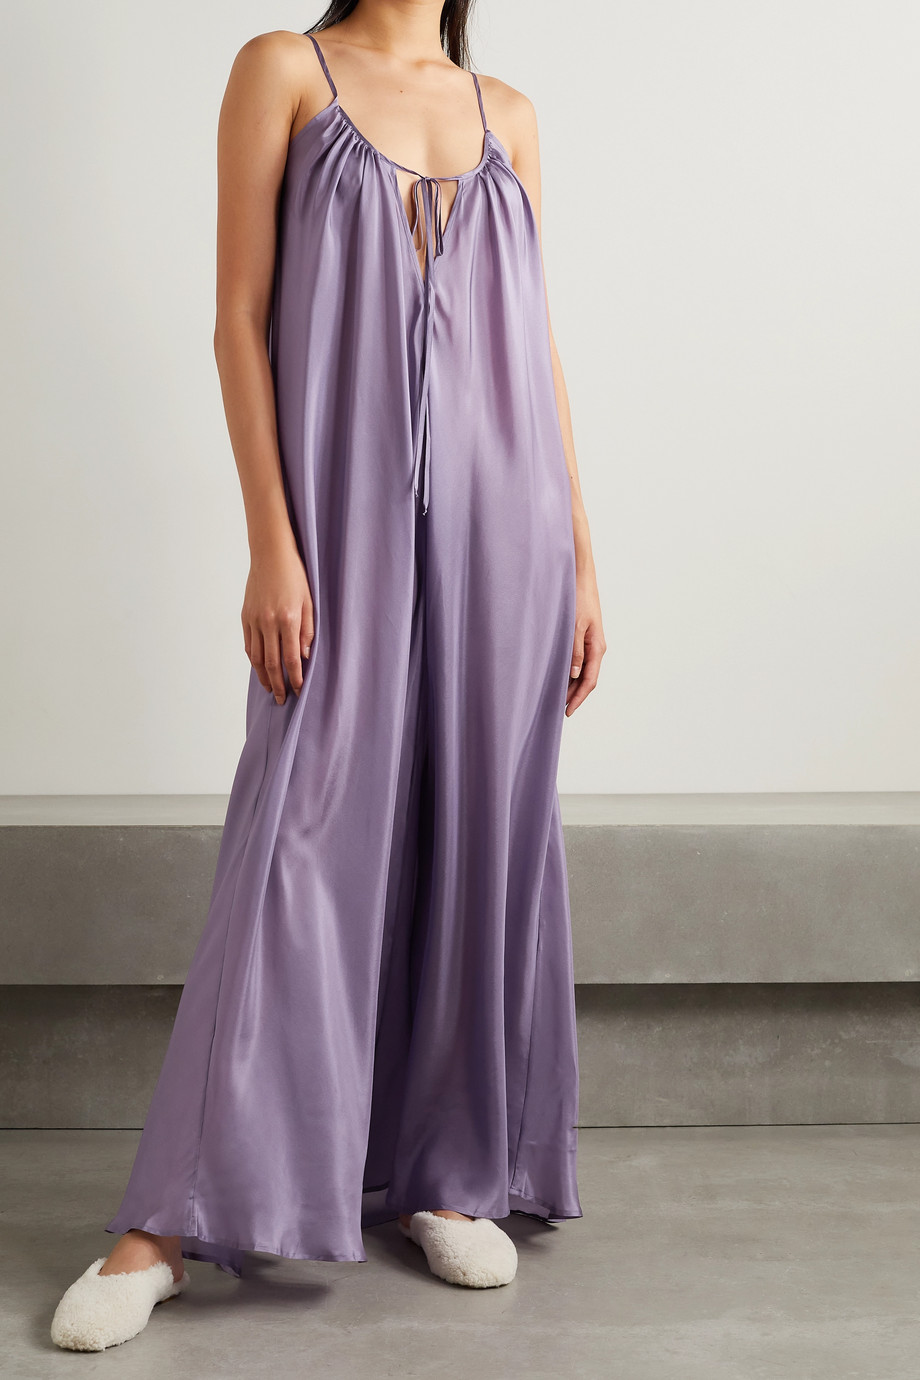 Pour Les Femmes Paris silk-habotai nightdress